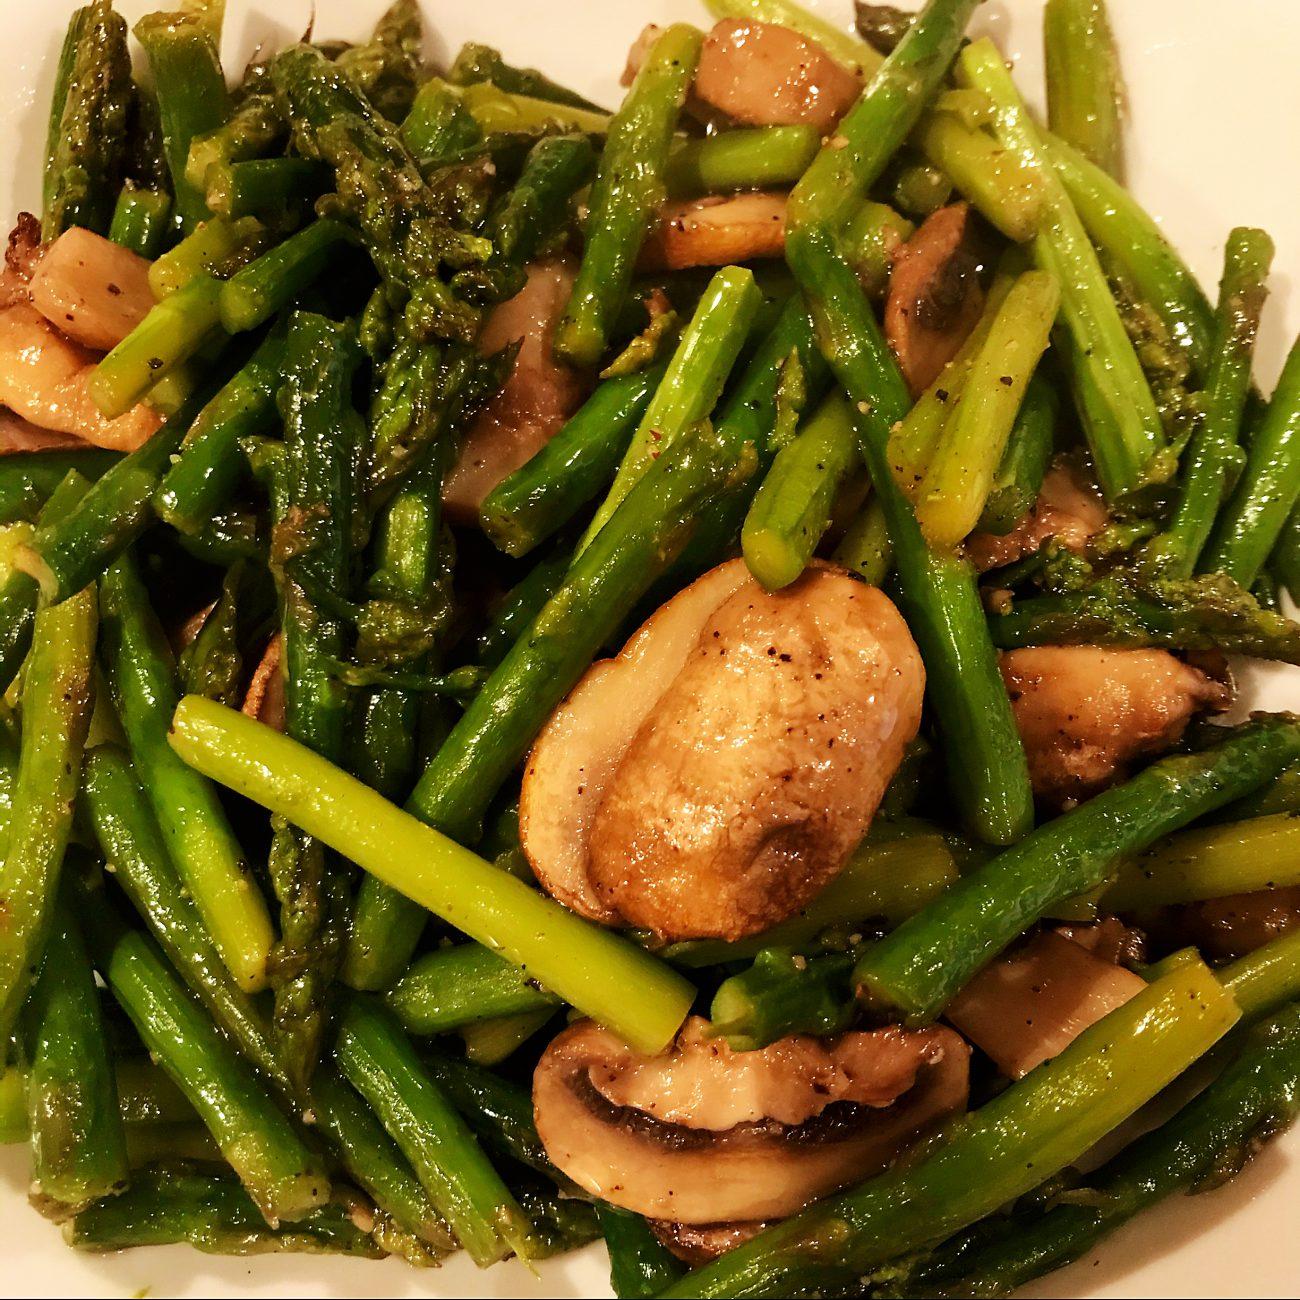 AirGO Grill Asparagus and Mushroom